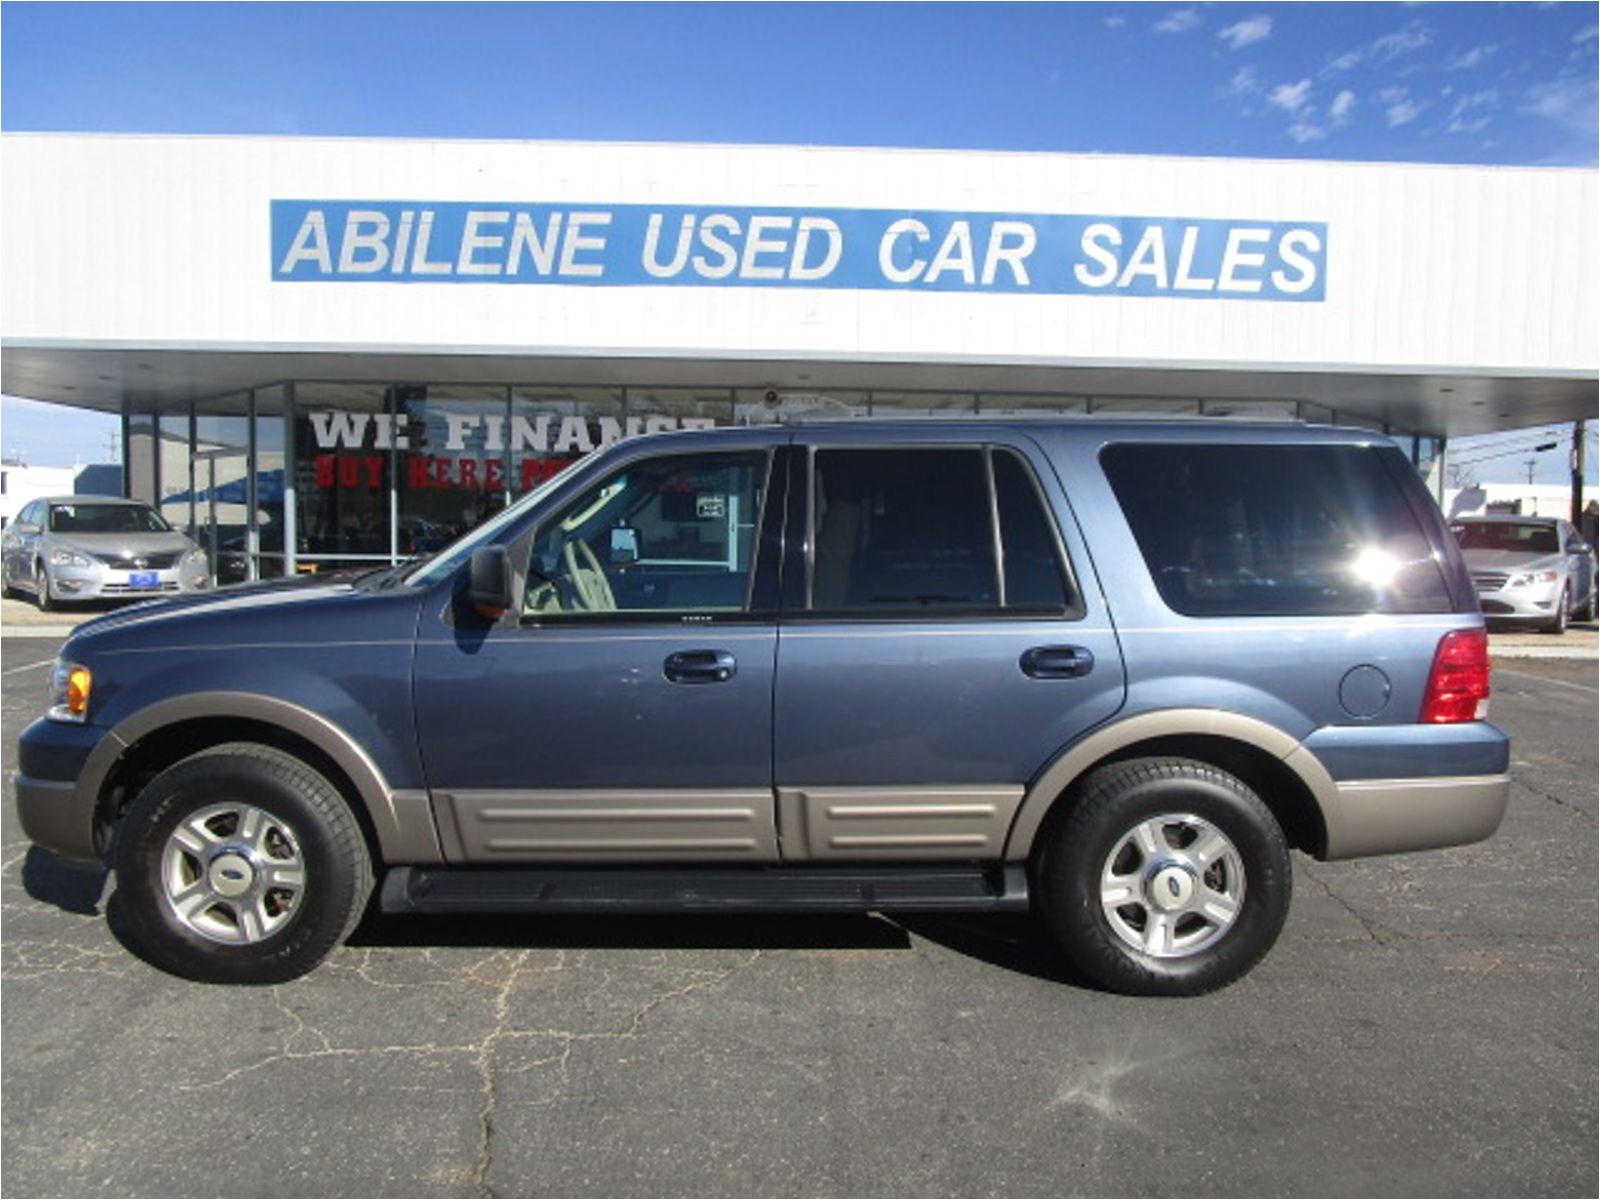 2003 ford expedition eddie bauer abilene tx abilene used car sales in abilene